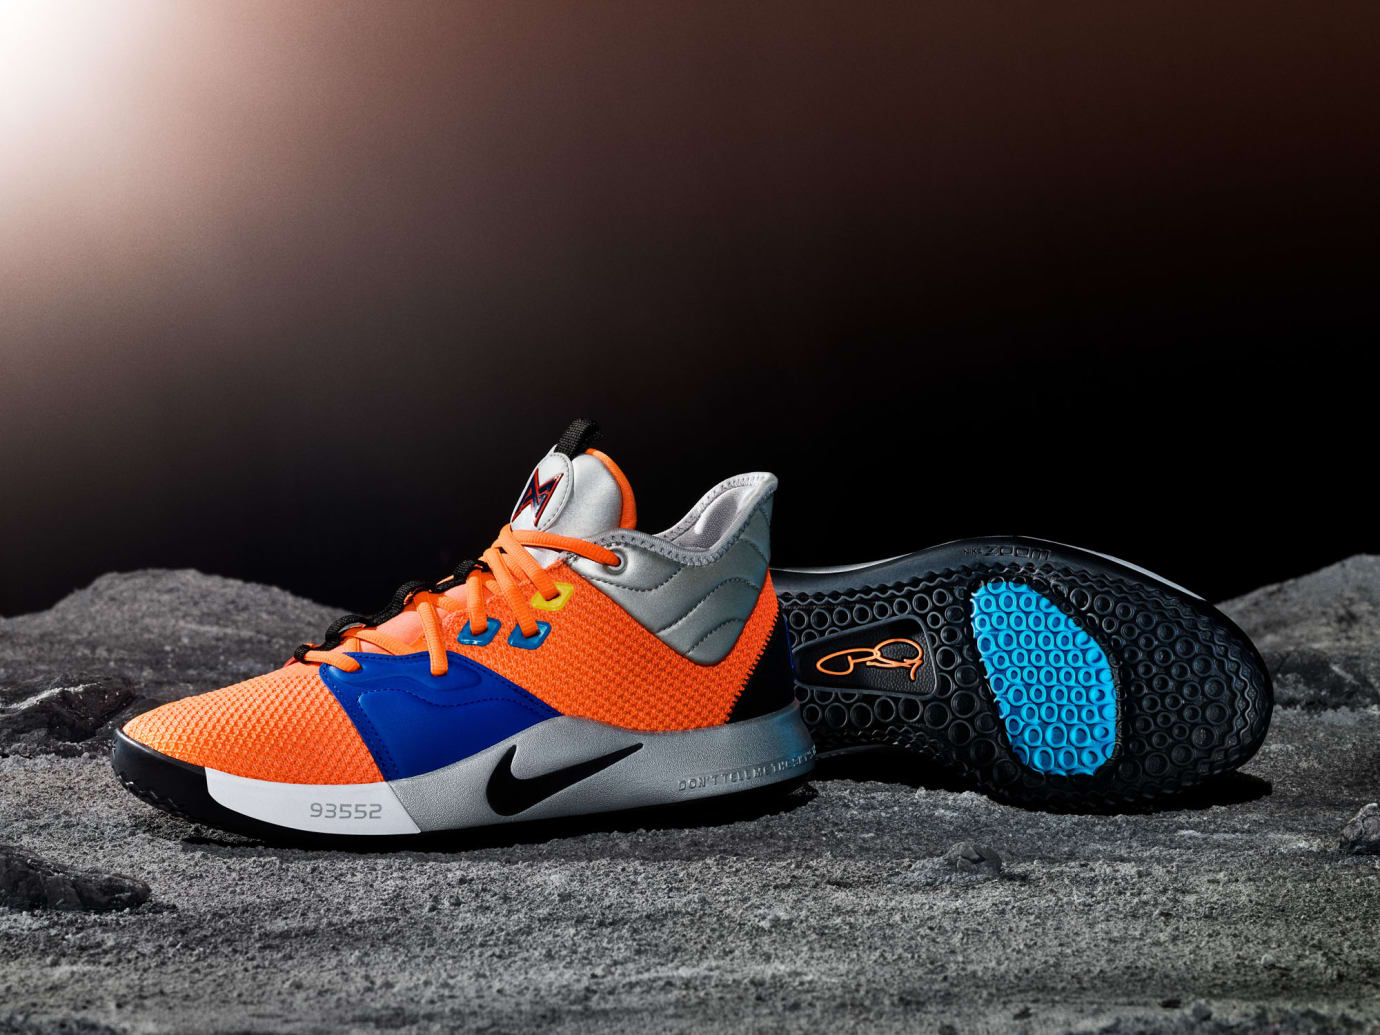 106eac3f8ff9d Image via Nike Nike PG 3 NASA Release Date CI2666-800 Moon